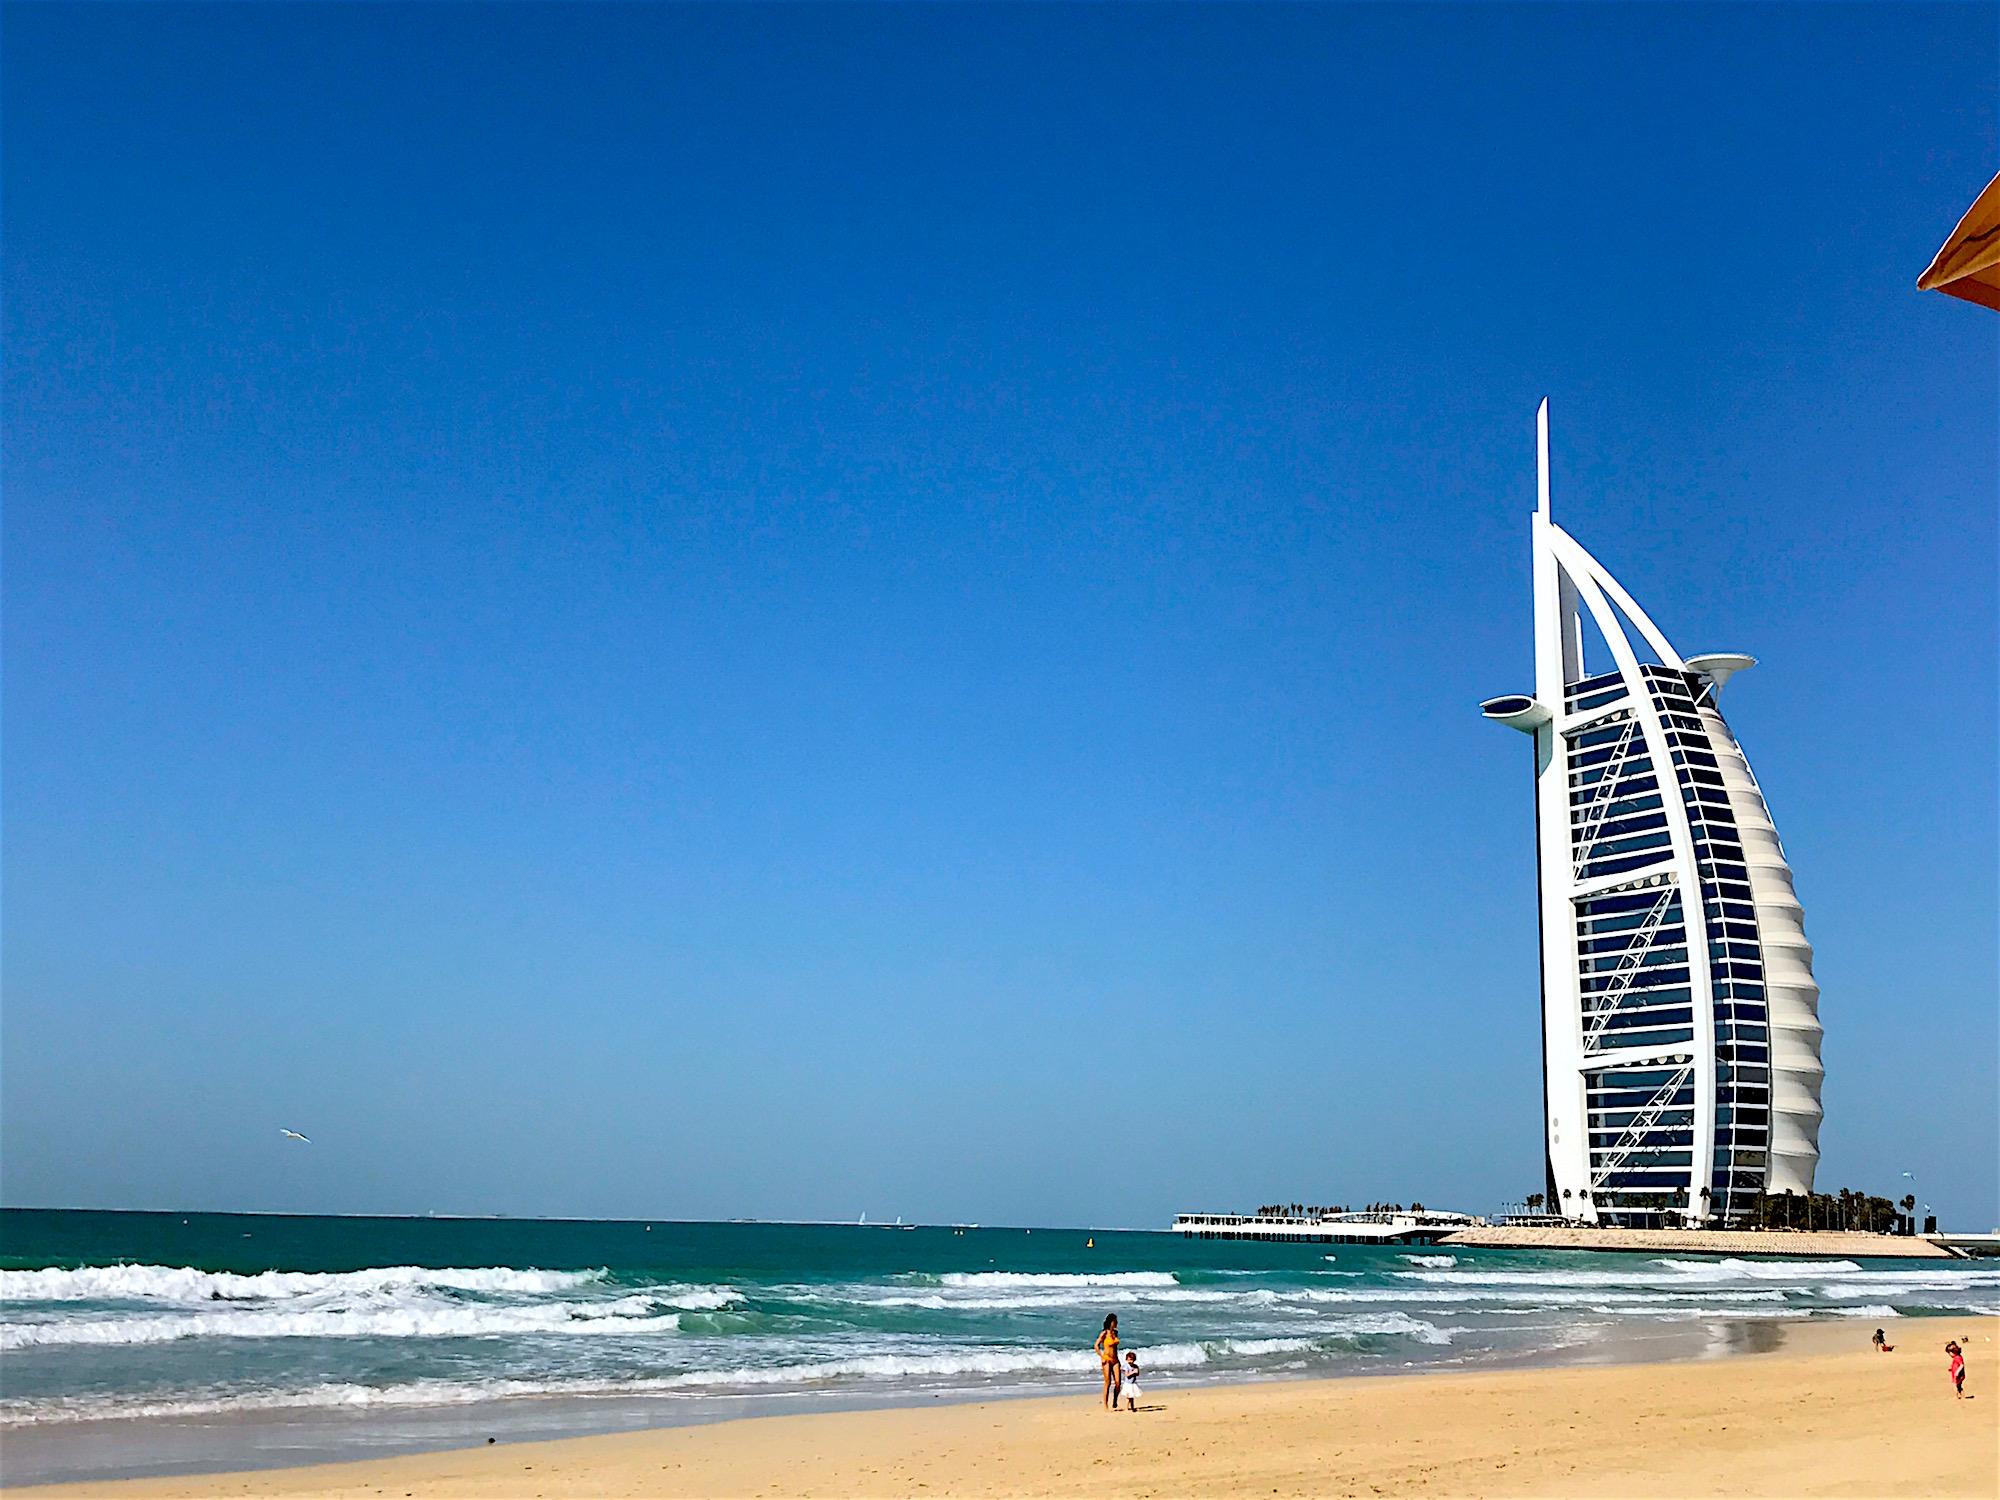 Jurmeriah Beach, Dubai with view of Burj Al Arab